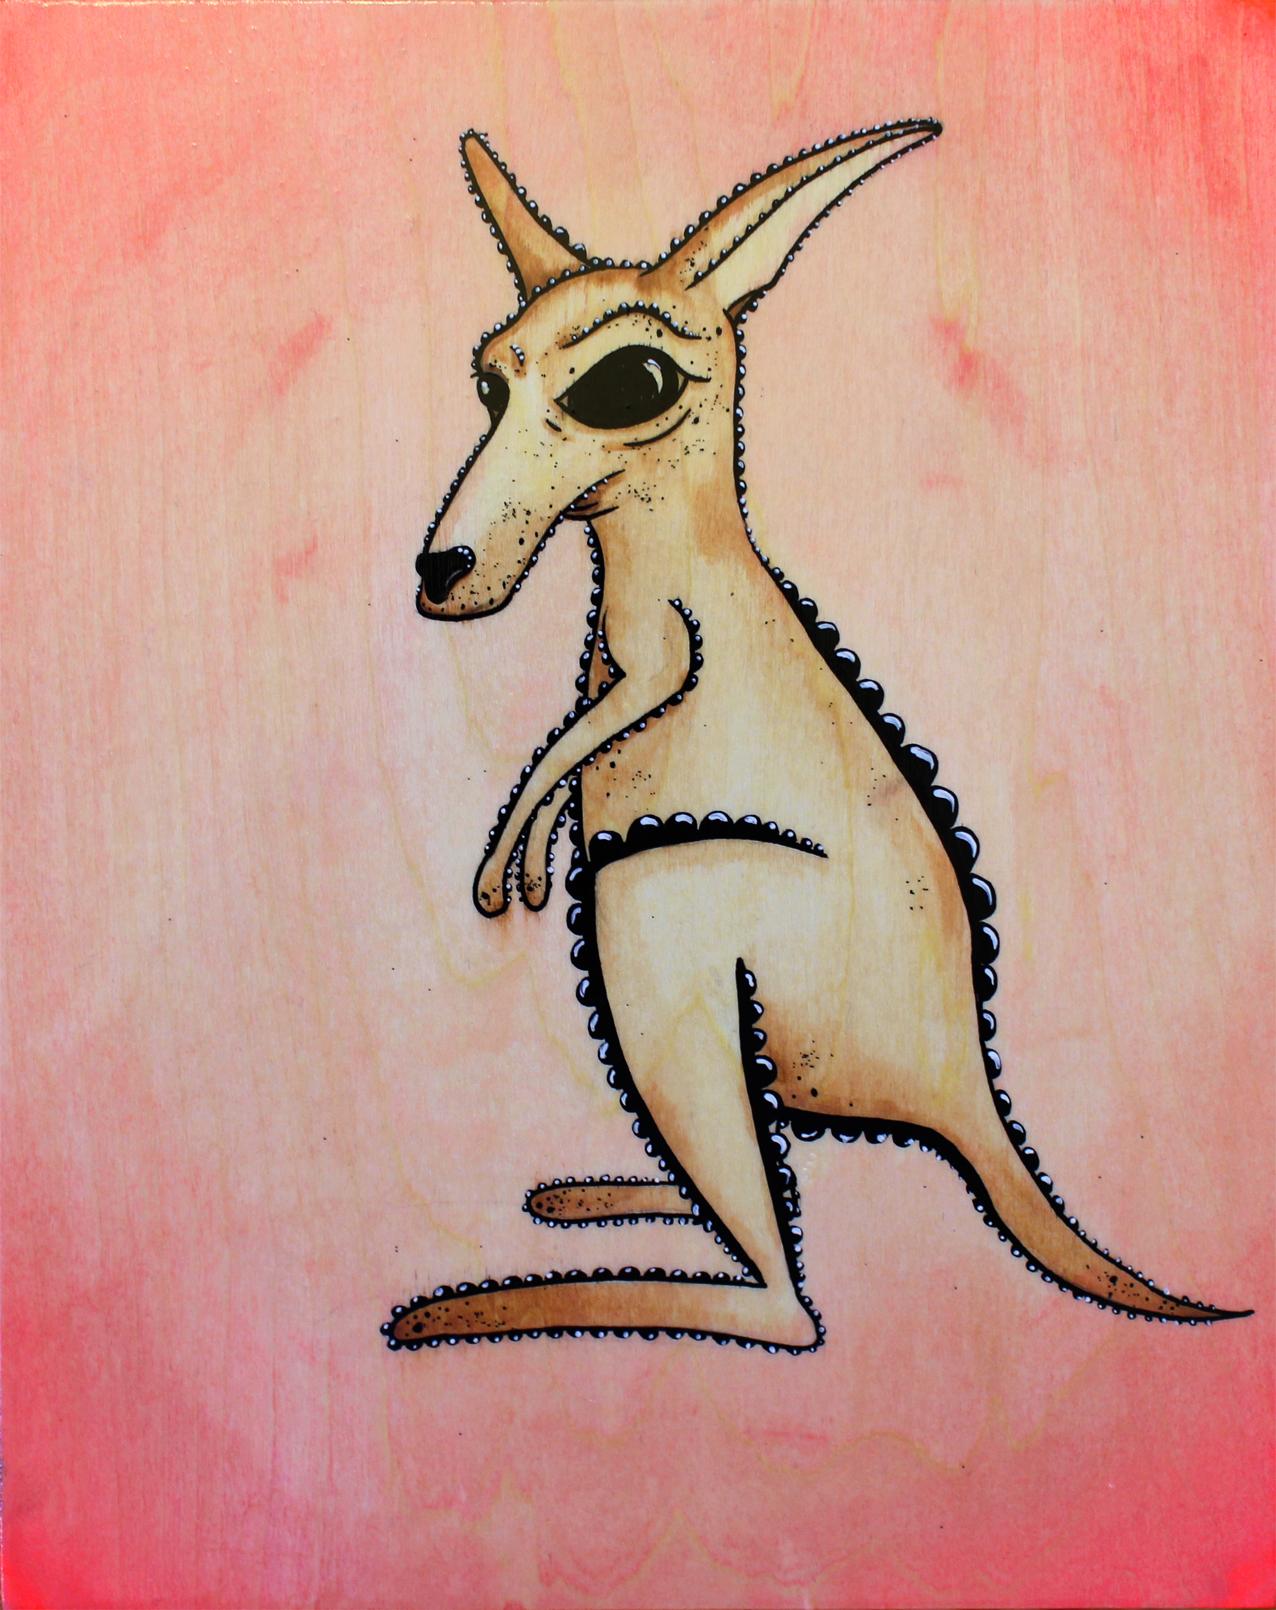 kangaroo_01.jpg